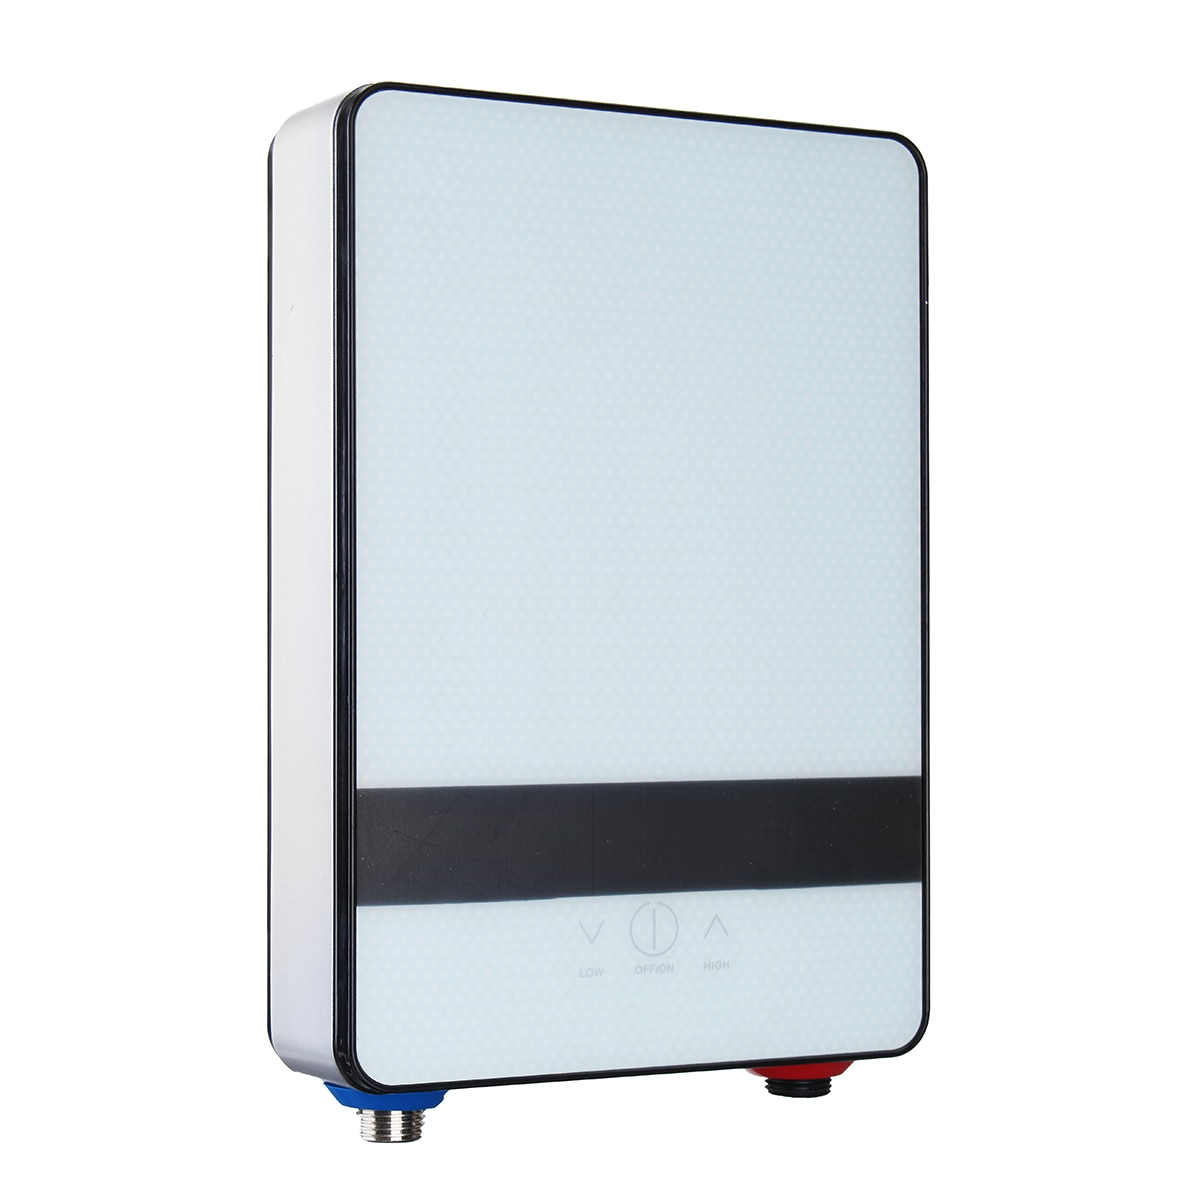 220V Tankless Electric Hot Water Instant Shower Heater Kitchen Bathroom Set Safe Intelligent Electric Water Heating Shower 6500W